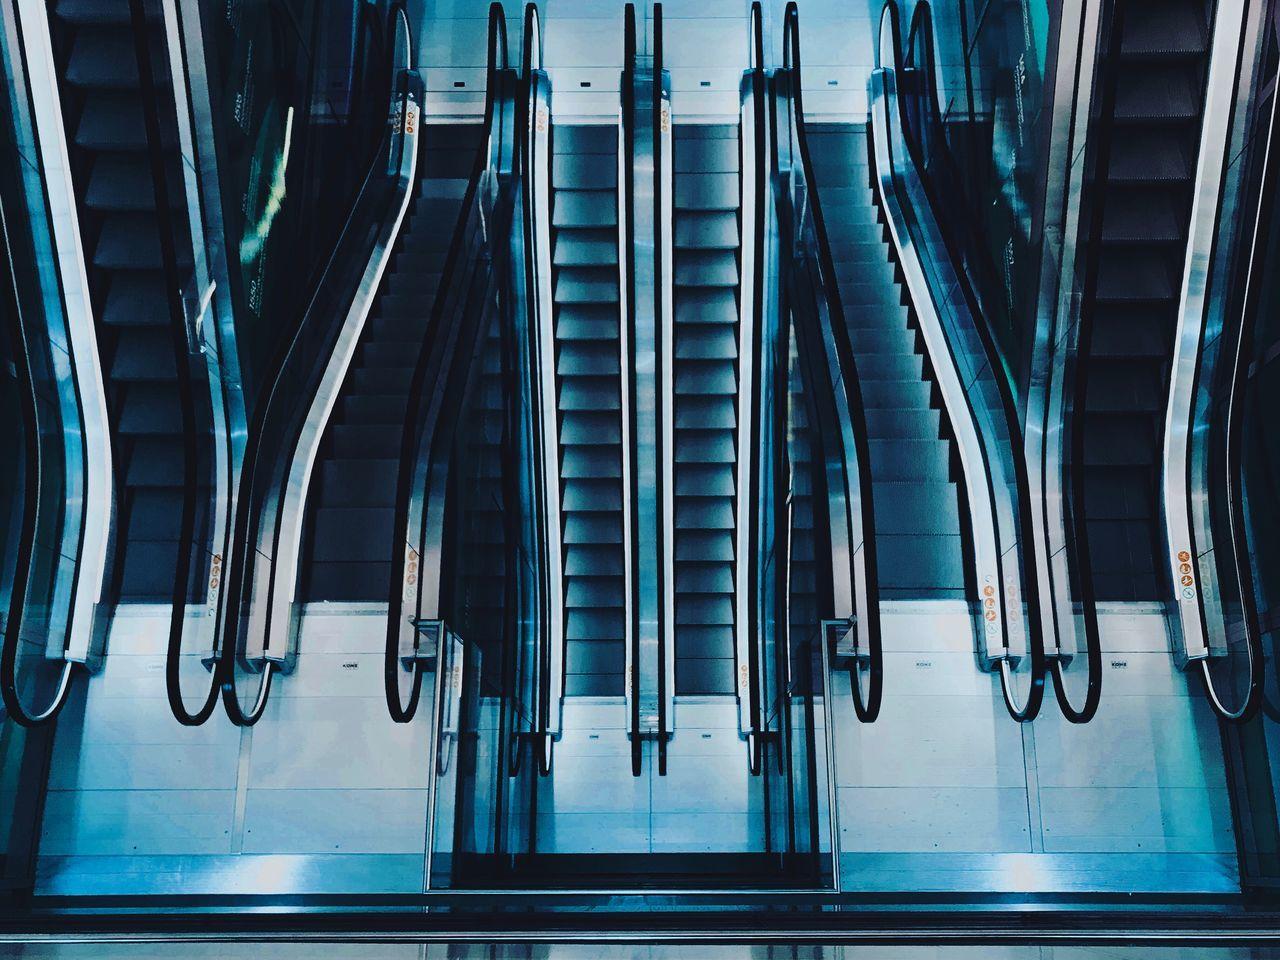 High Angle View Of Escalators